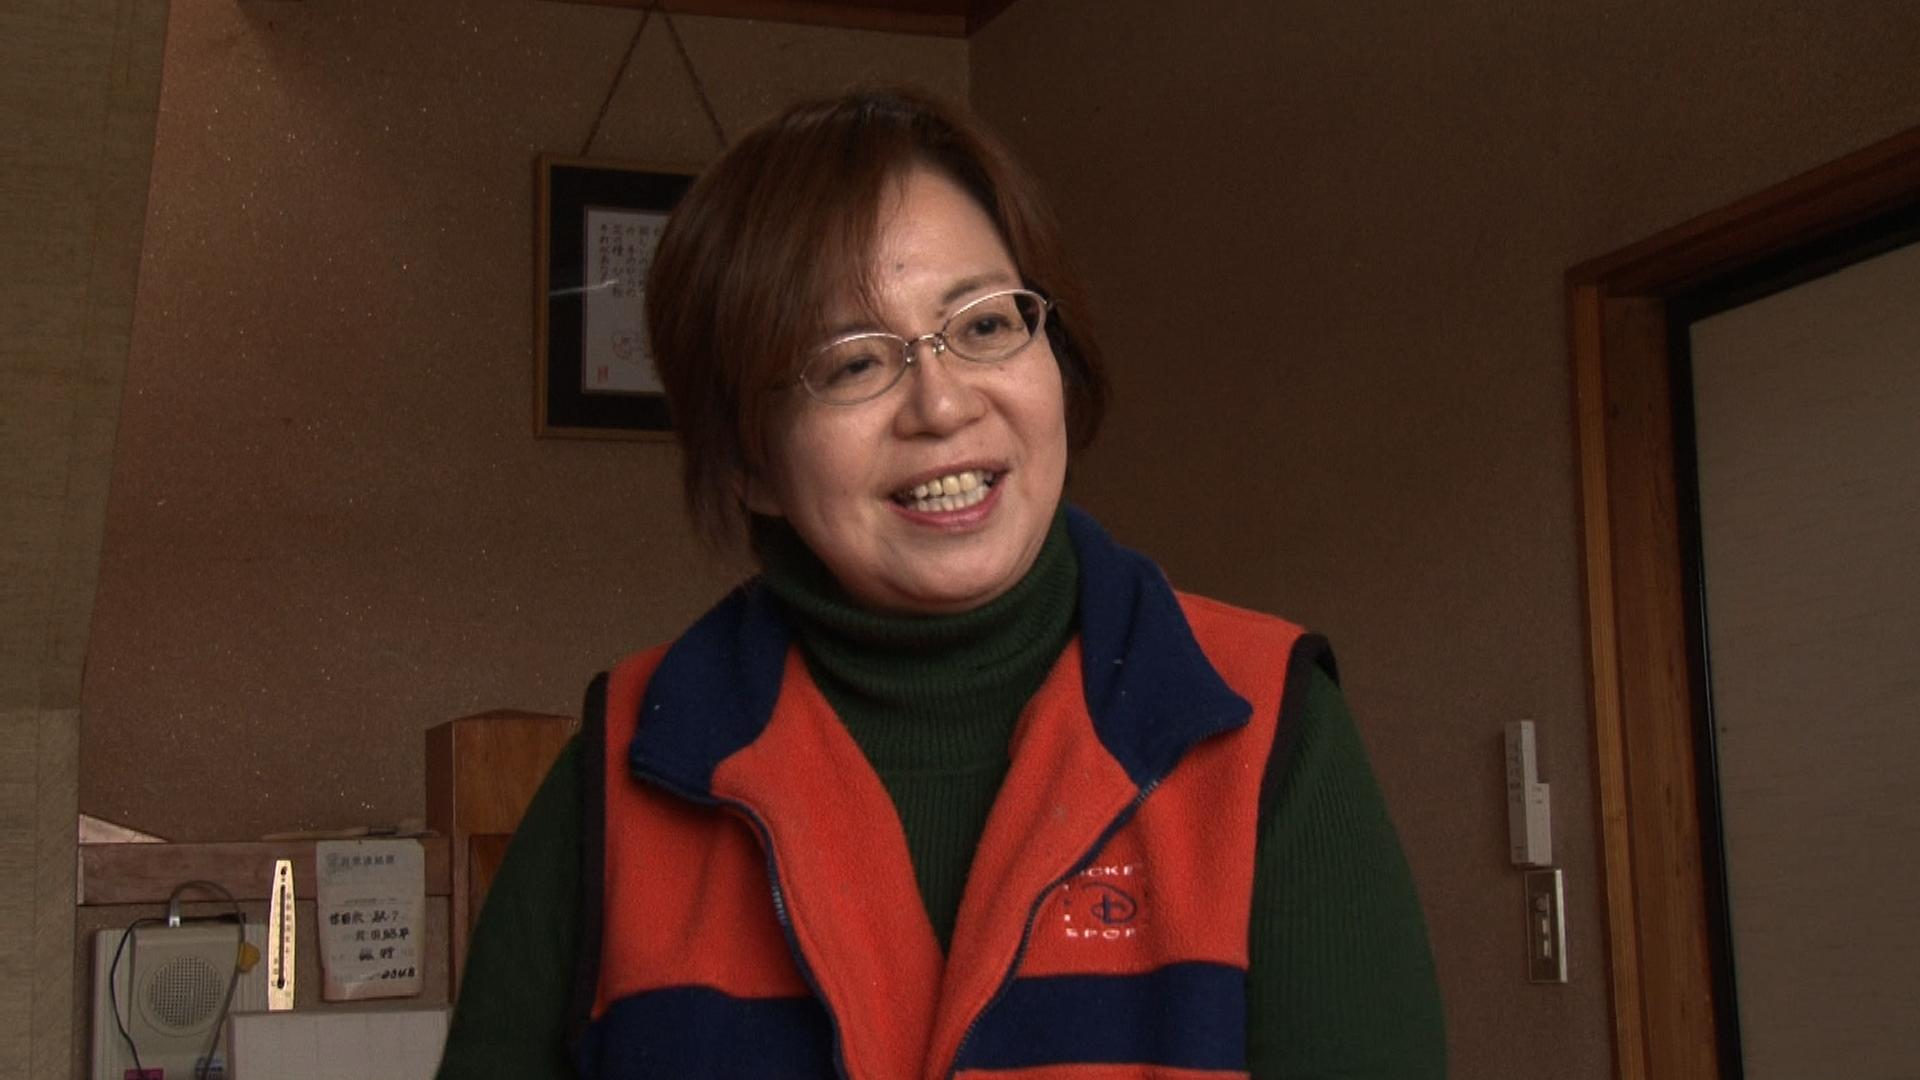 松田千秋 - Chiaki Matsuda